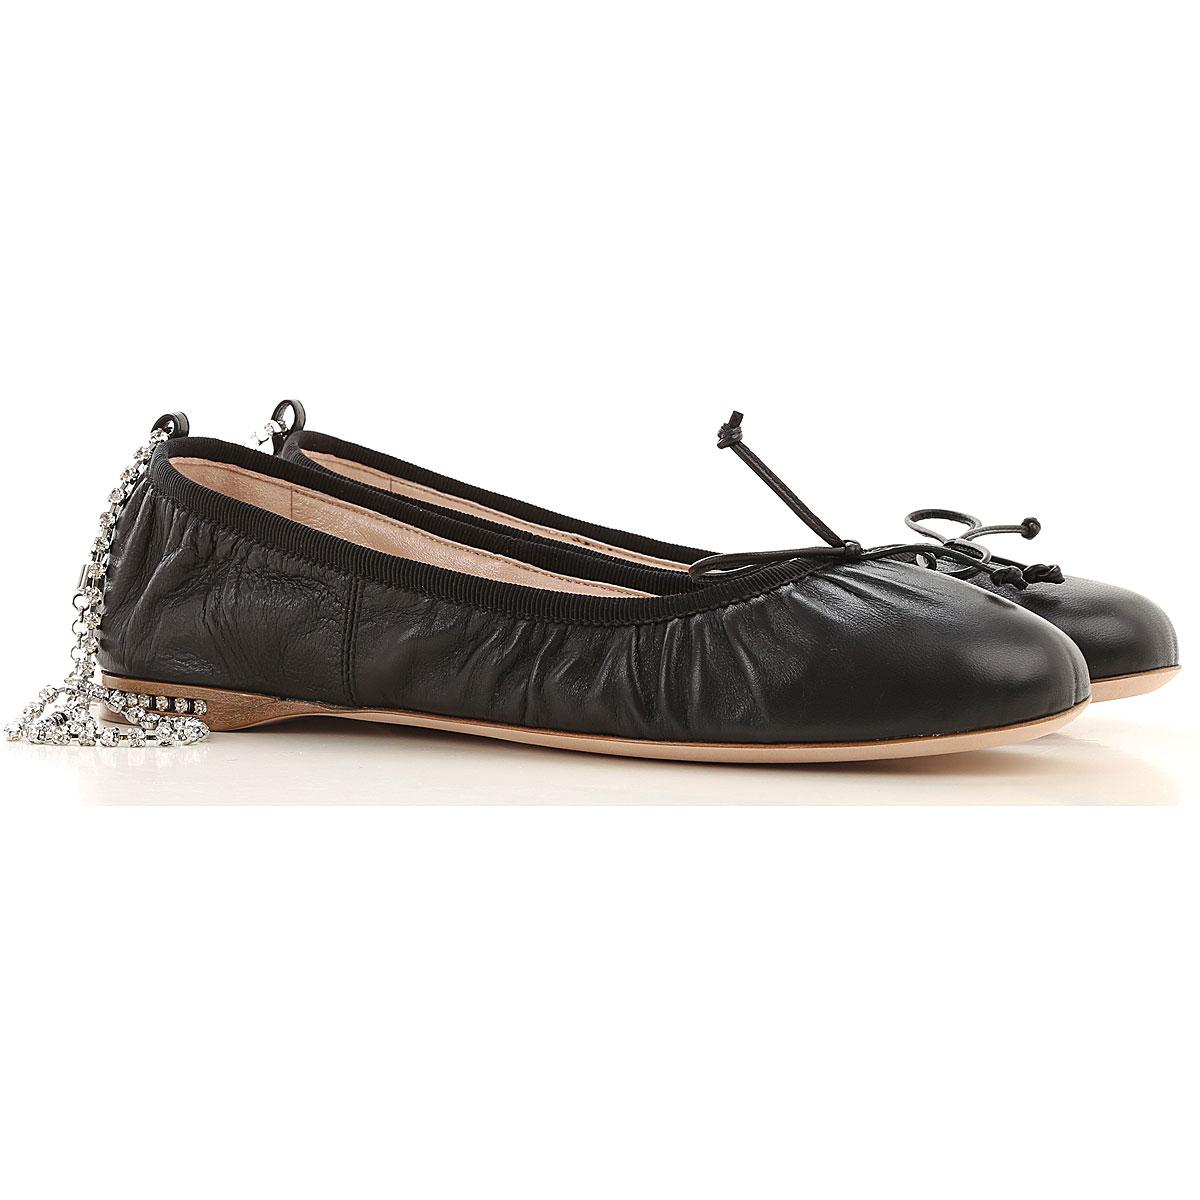 Miu Miu Ballet Flats Ballerina Shoes for Women On Sale, Black, Leather, 2019, 10 5.5 6 6.5 7 7.5 8 8.5 9